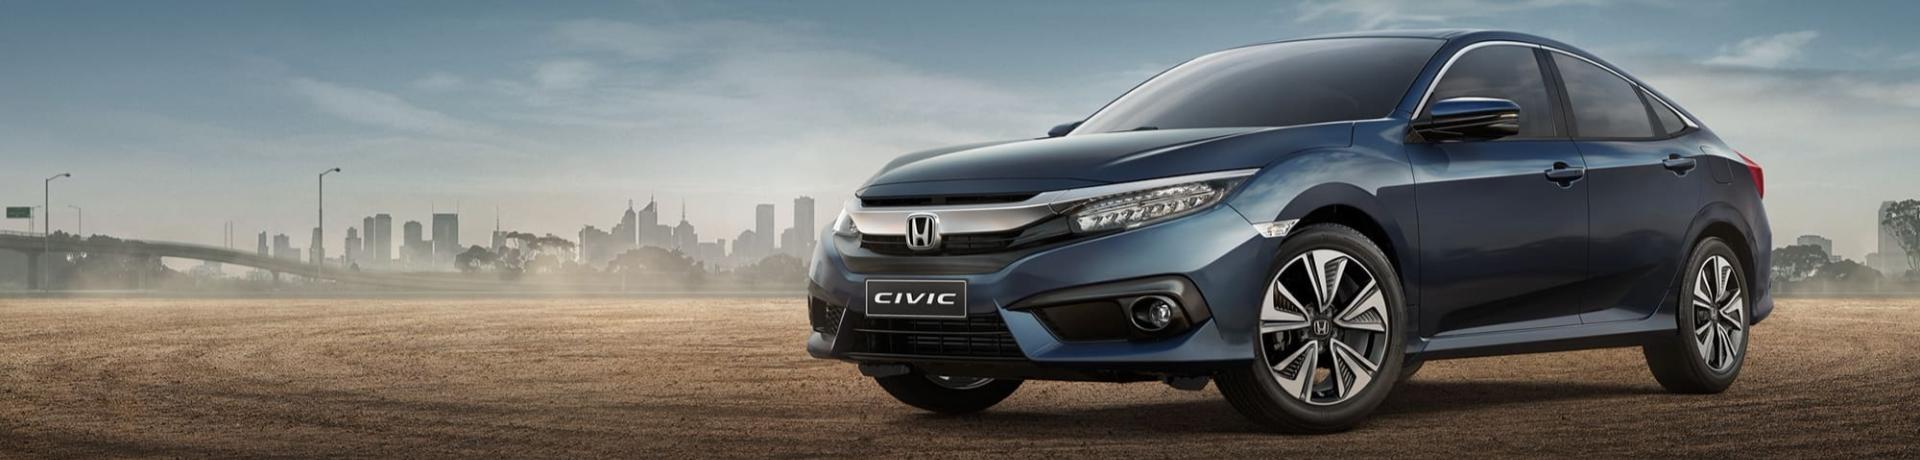 Honda dealers in sydney